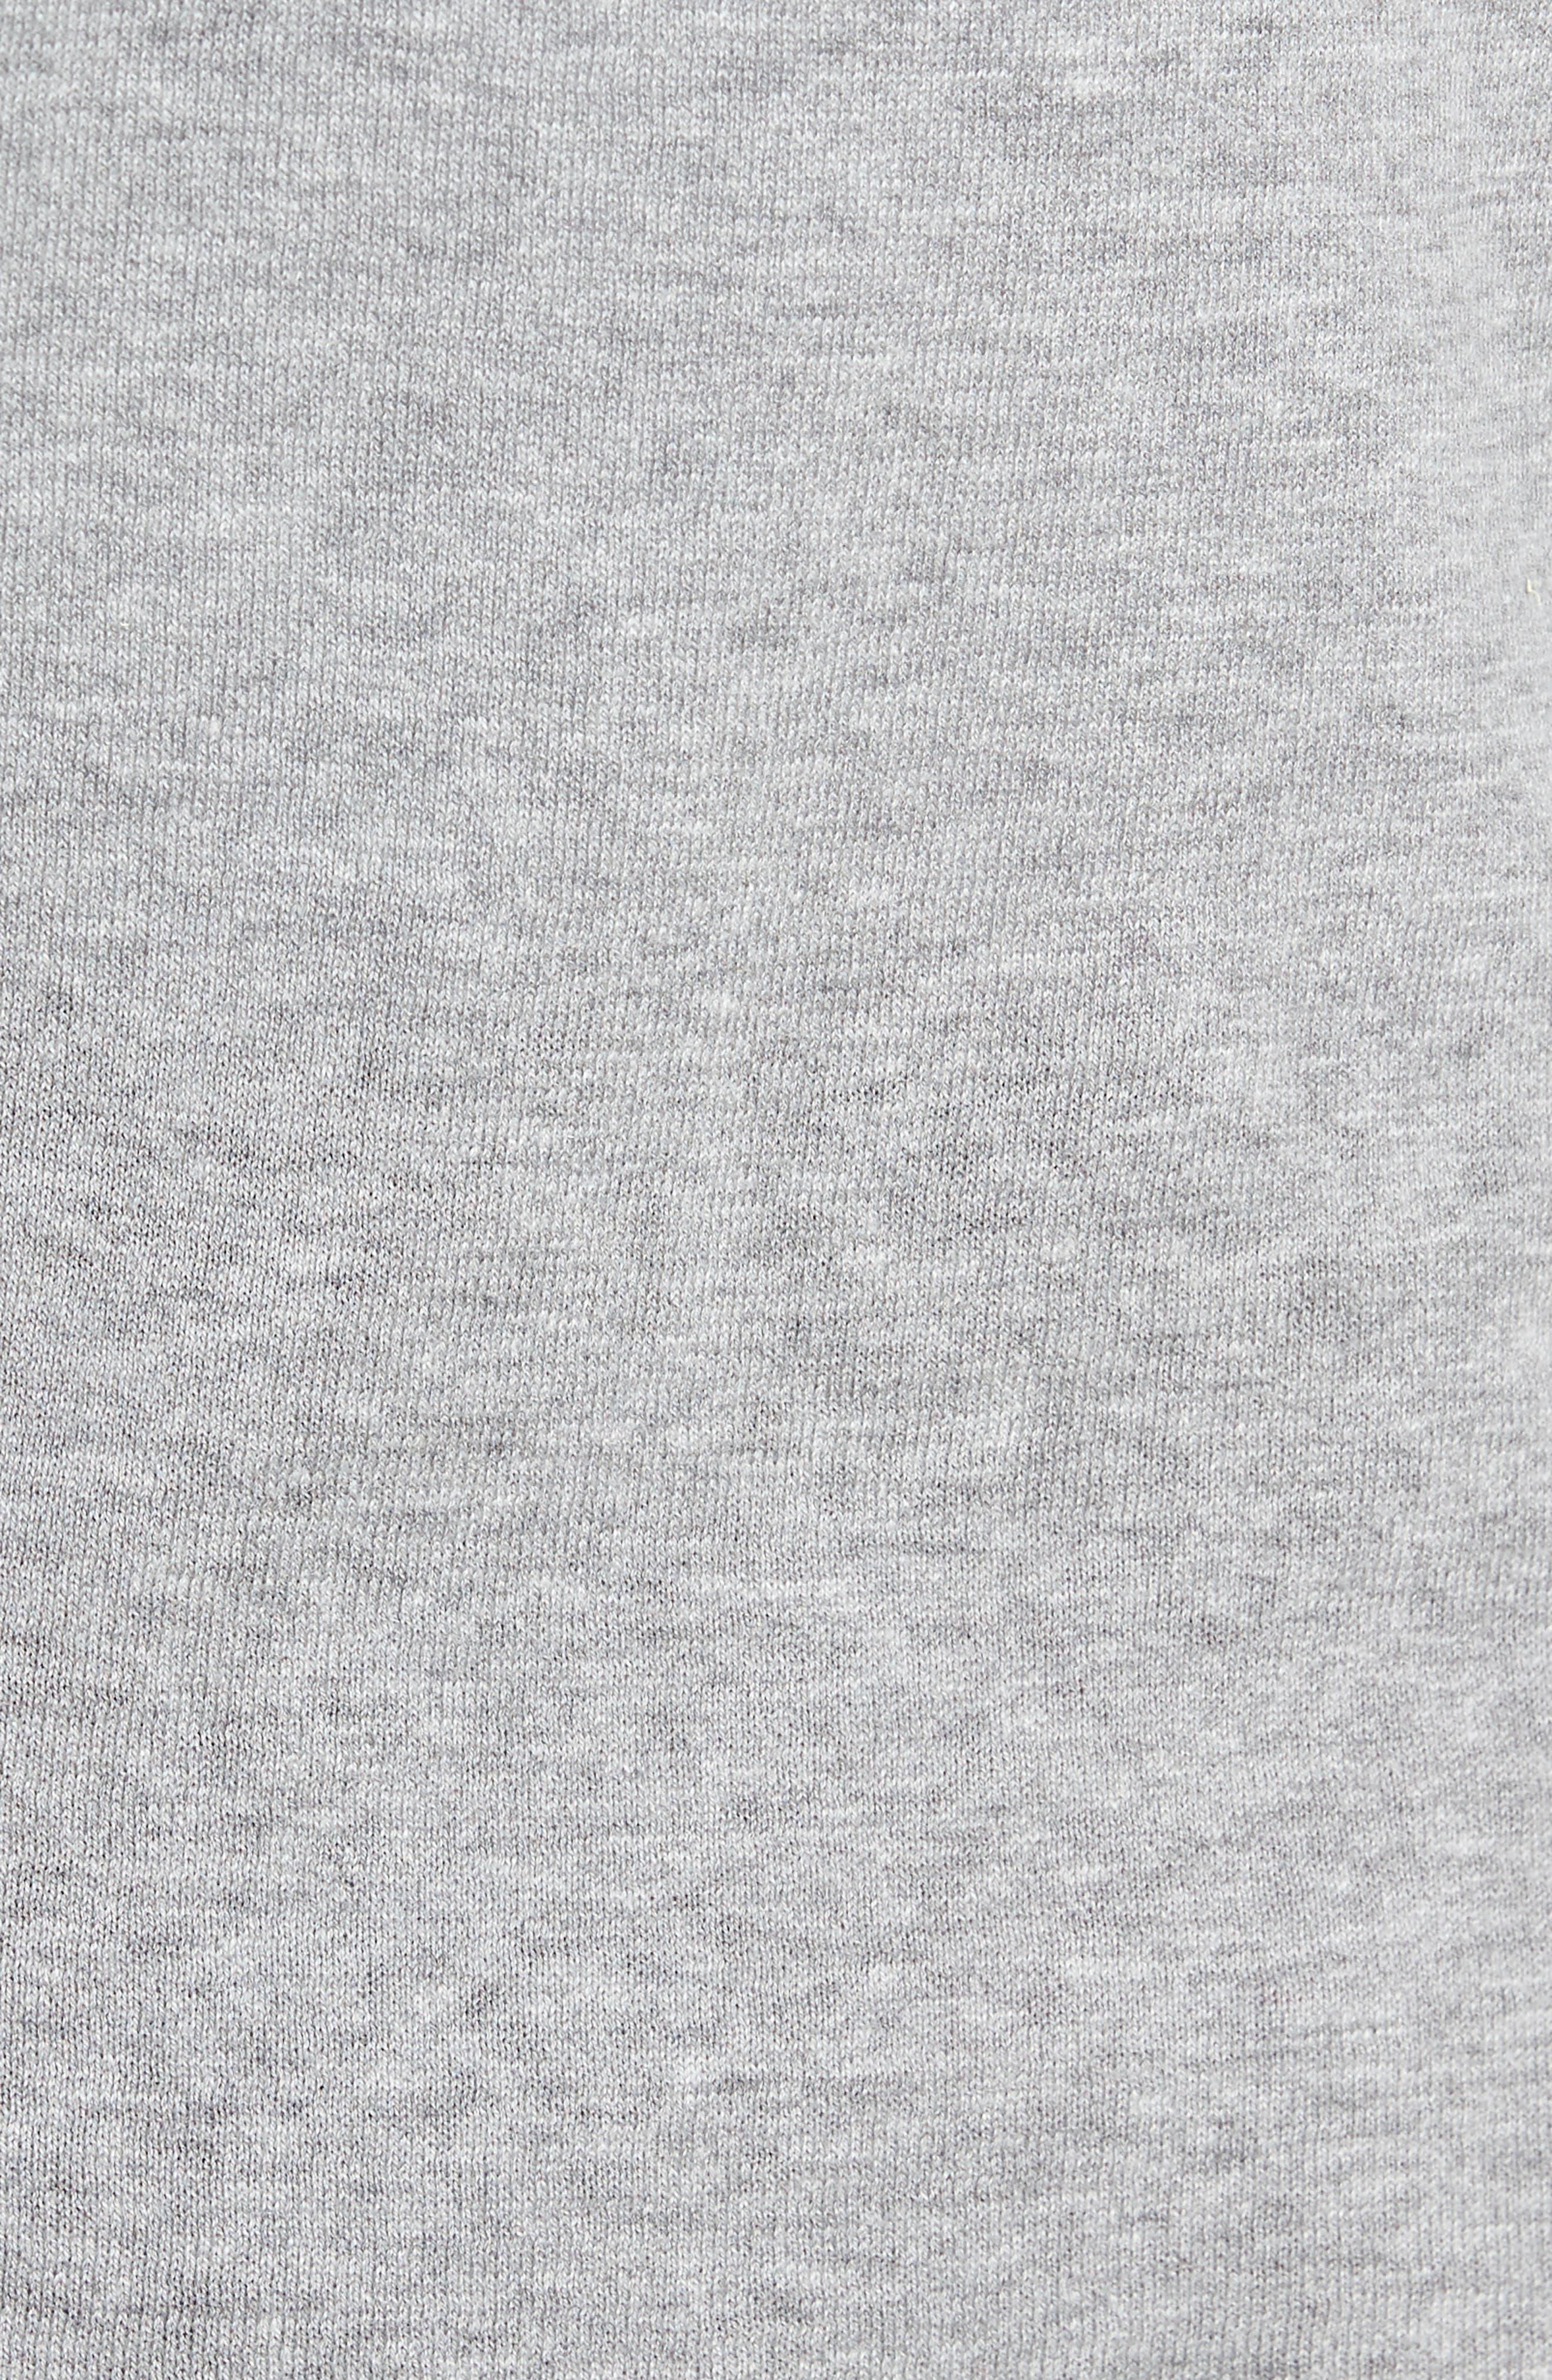 Long Sleeve Cotton & Linen Blend Henley,                             Alternate thumbnail 5, color,                             030